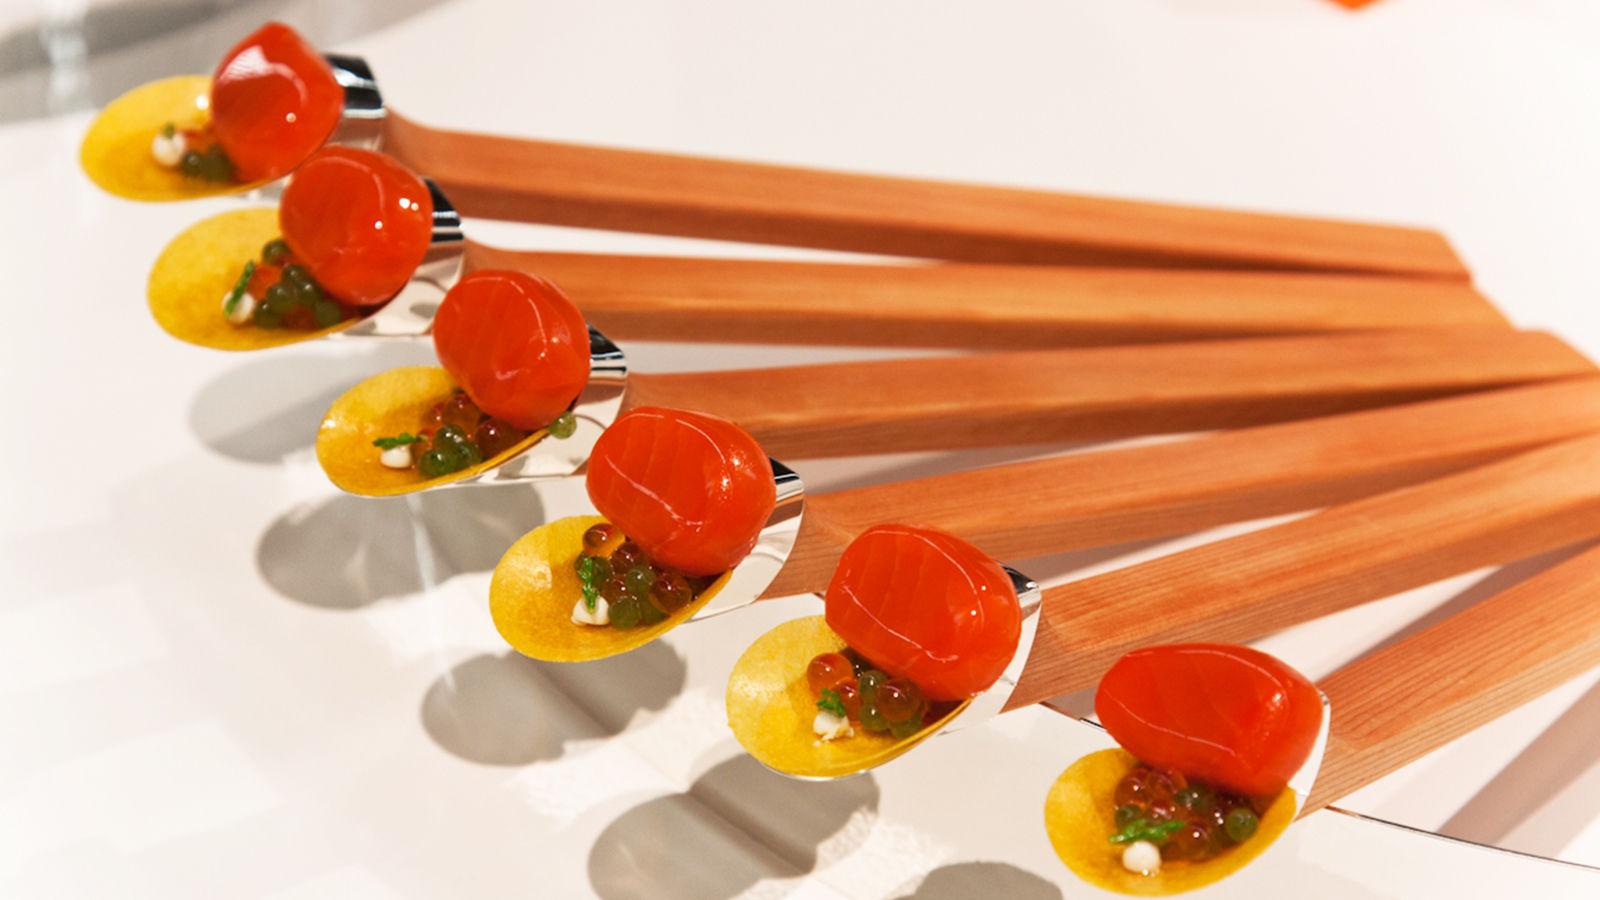 Gold Medal - 2012 Culinary World Olympics - Culinary Team Canada - Chef Patrick Gayler